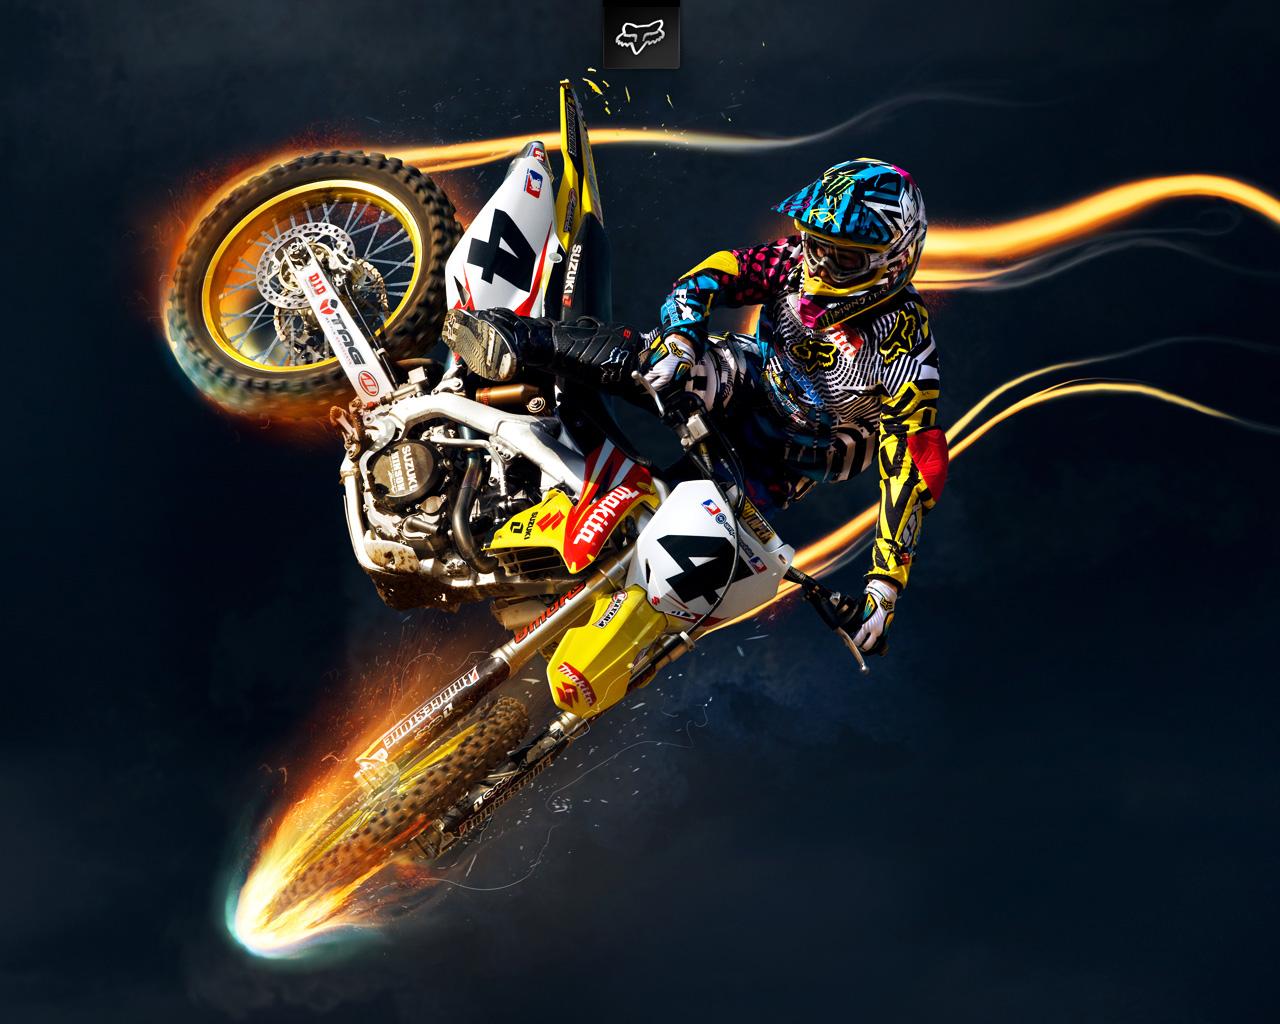 Coole Motocross Wallpaper   Moto Cross   Offroadforen Community 1280x1024